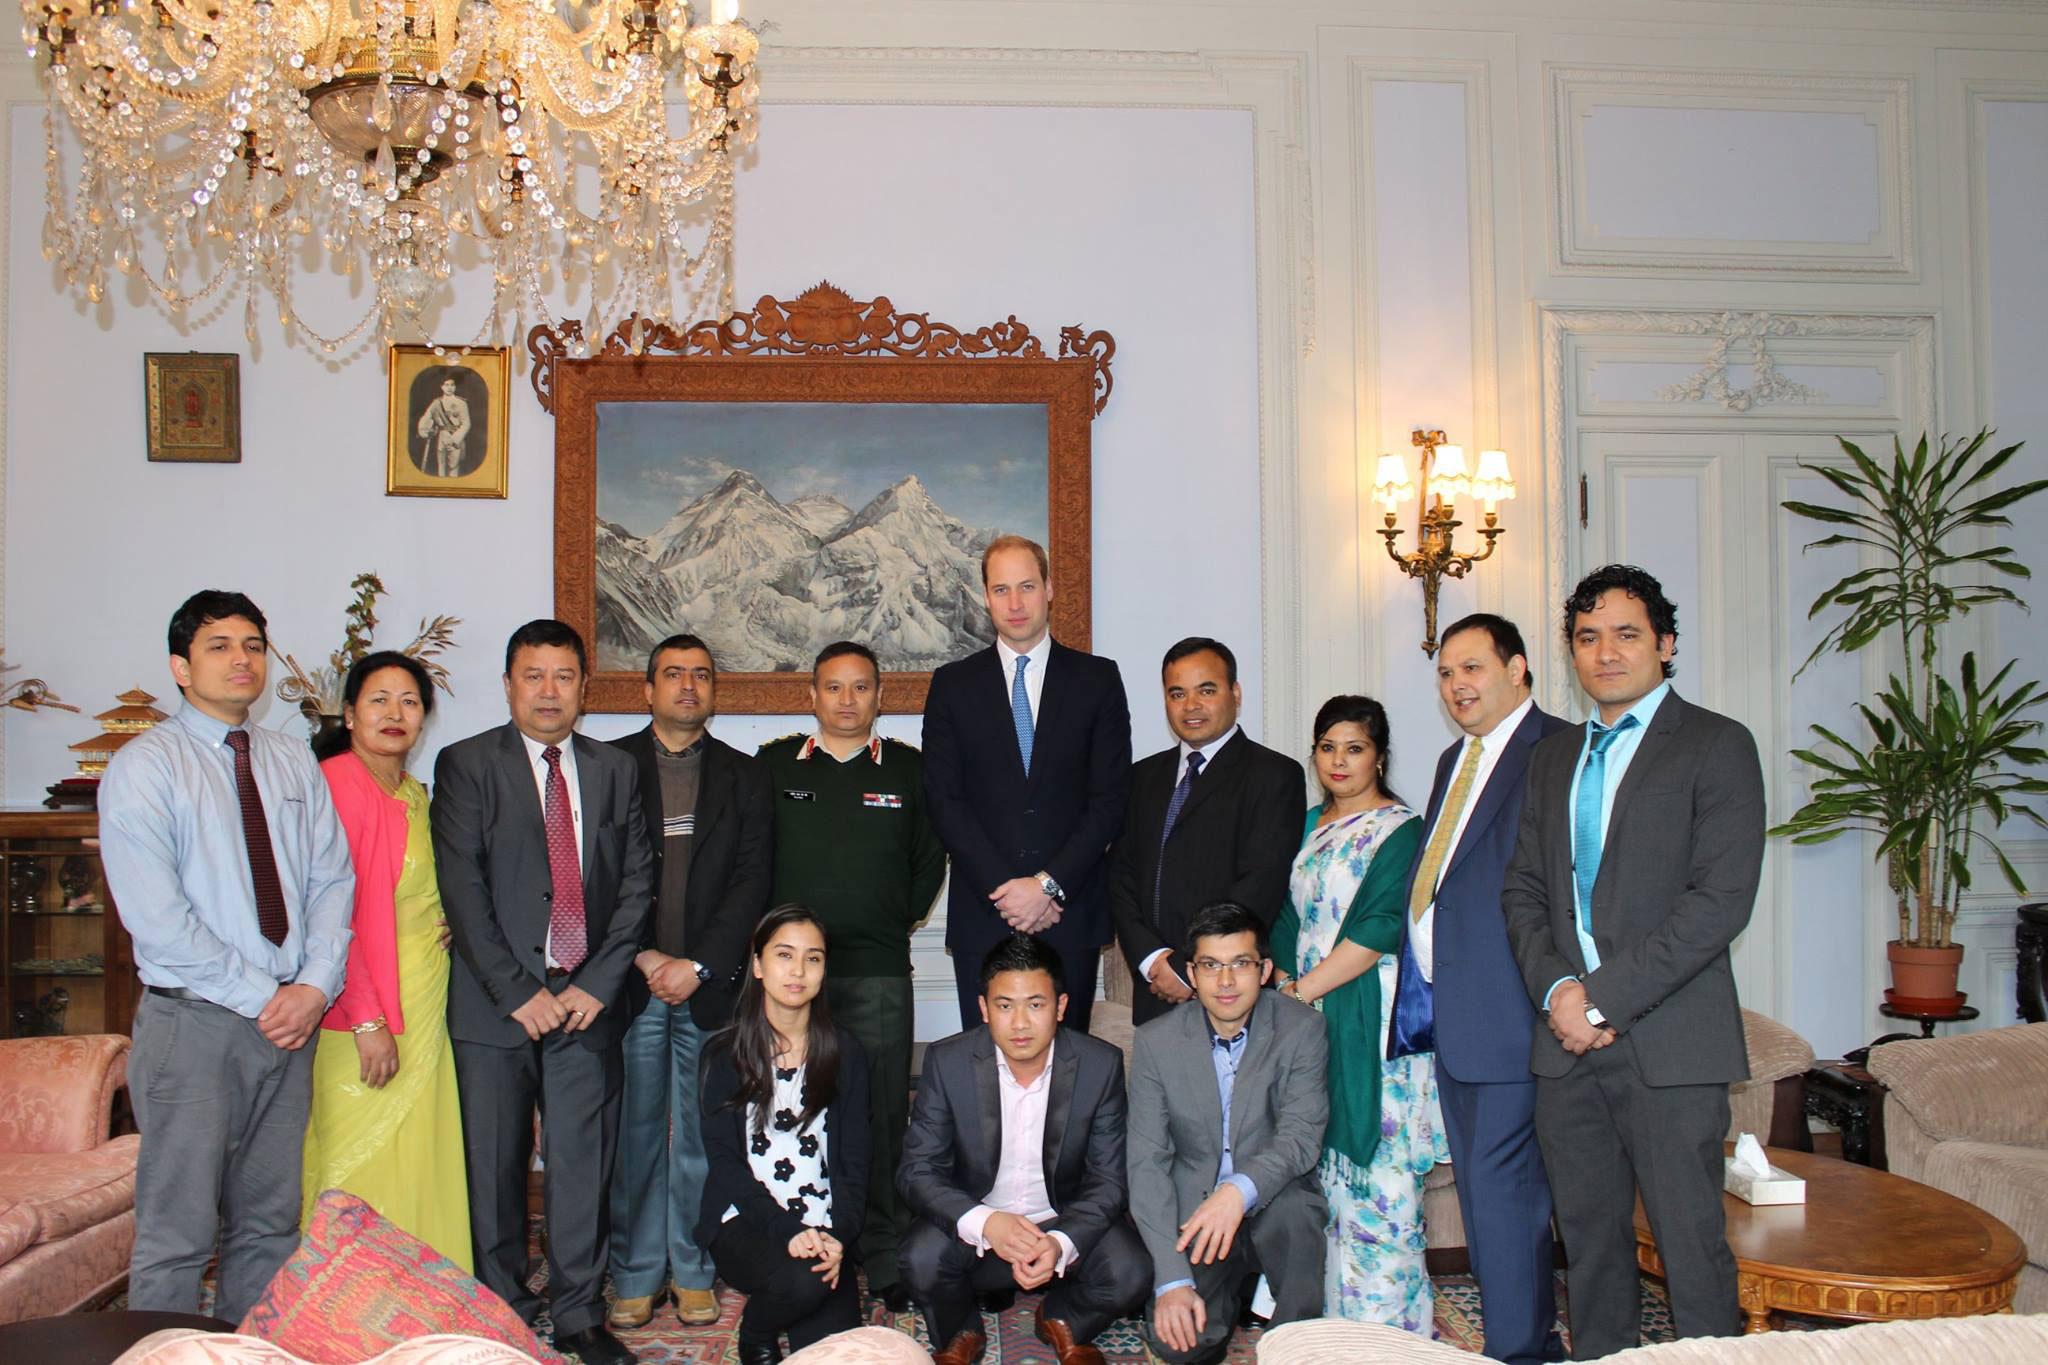 Prince-William-Nepal-Embassy-London-3